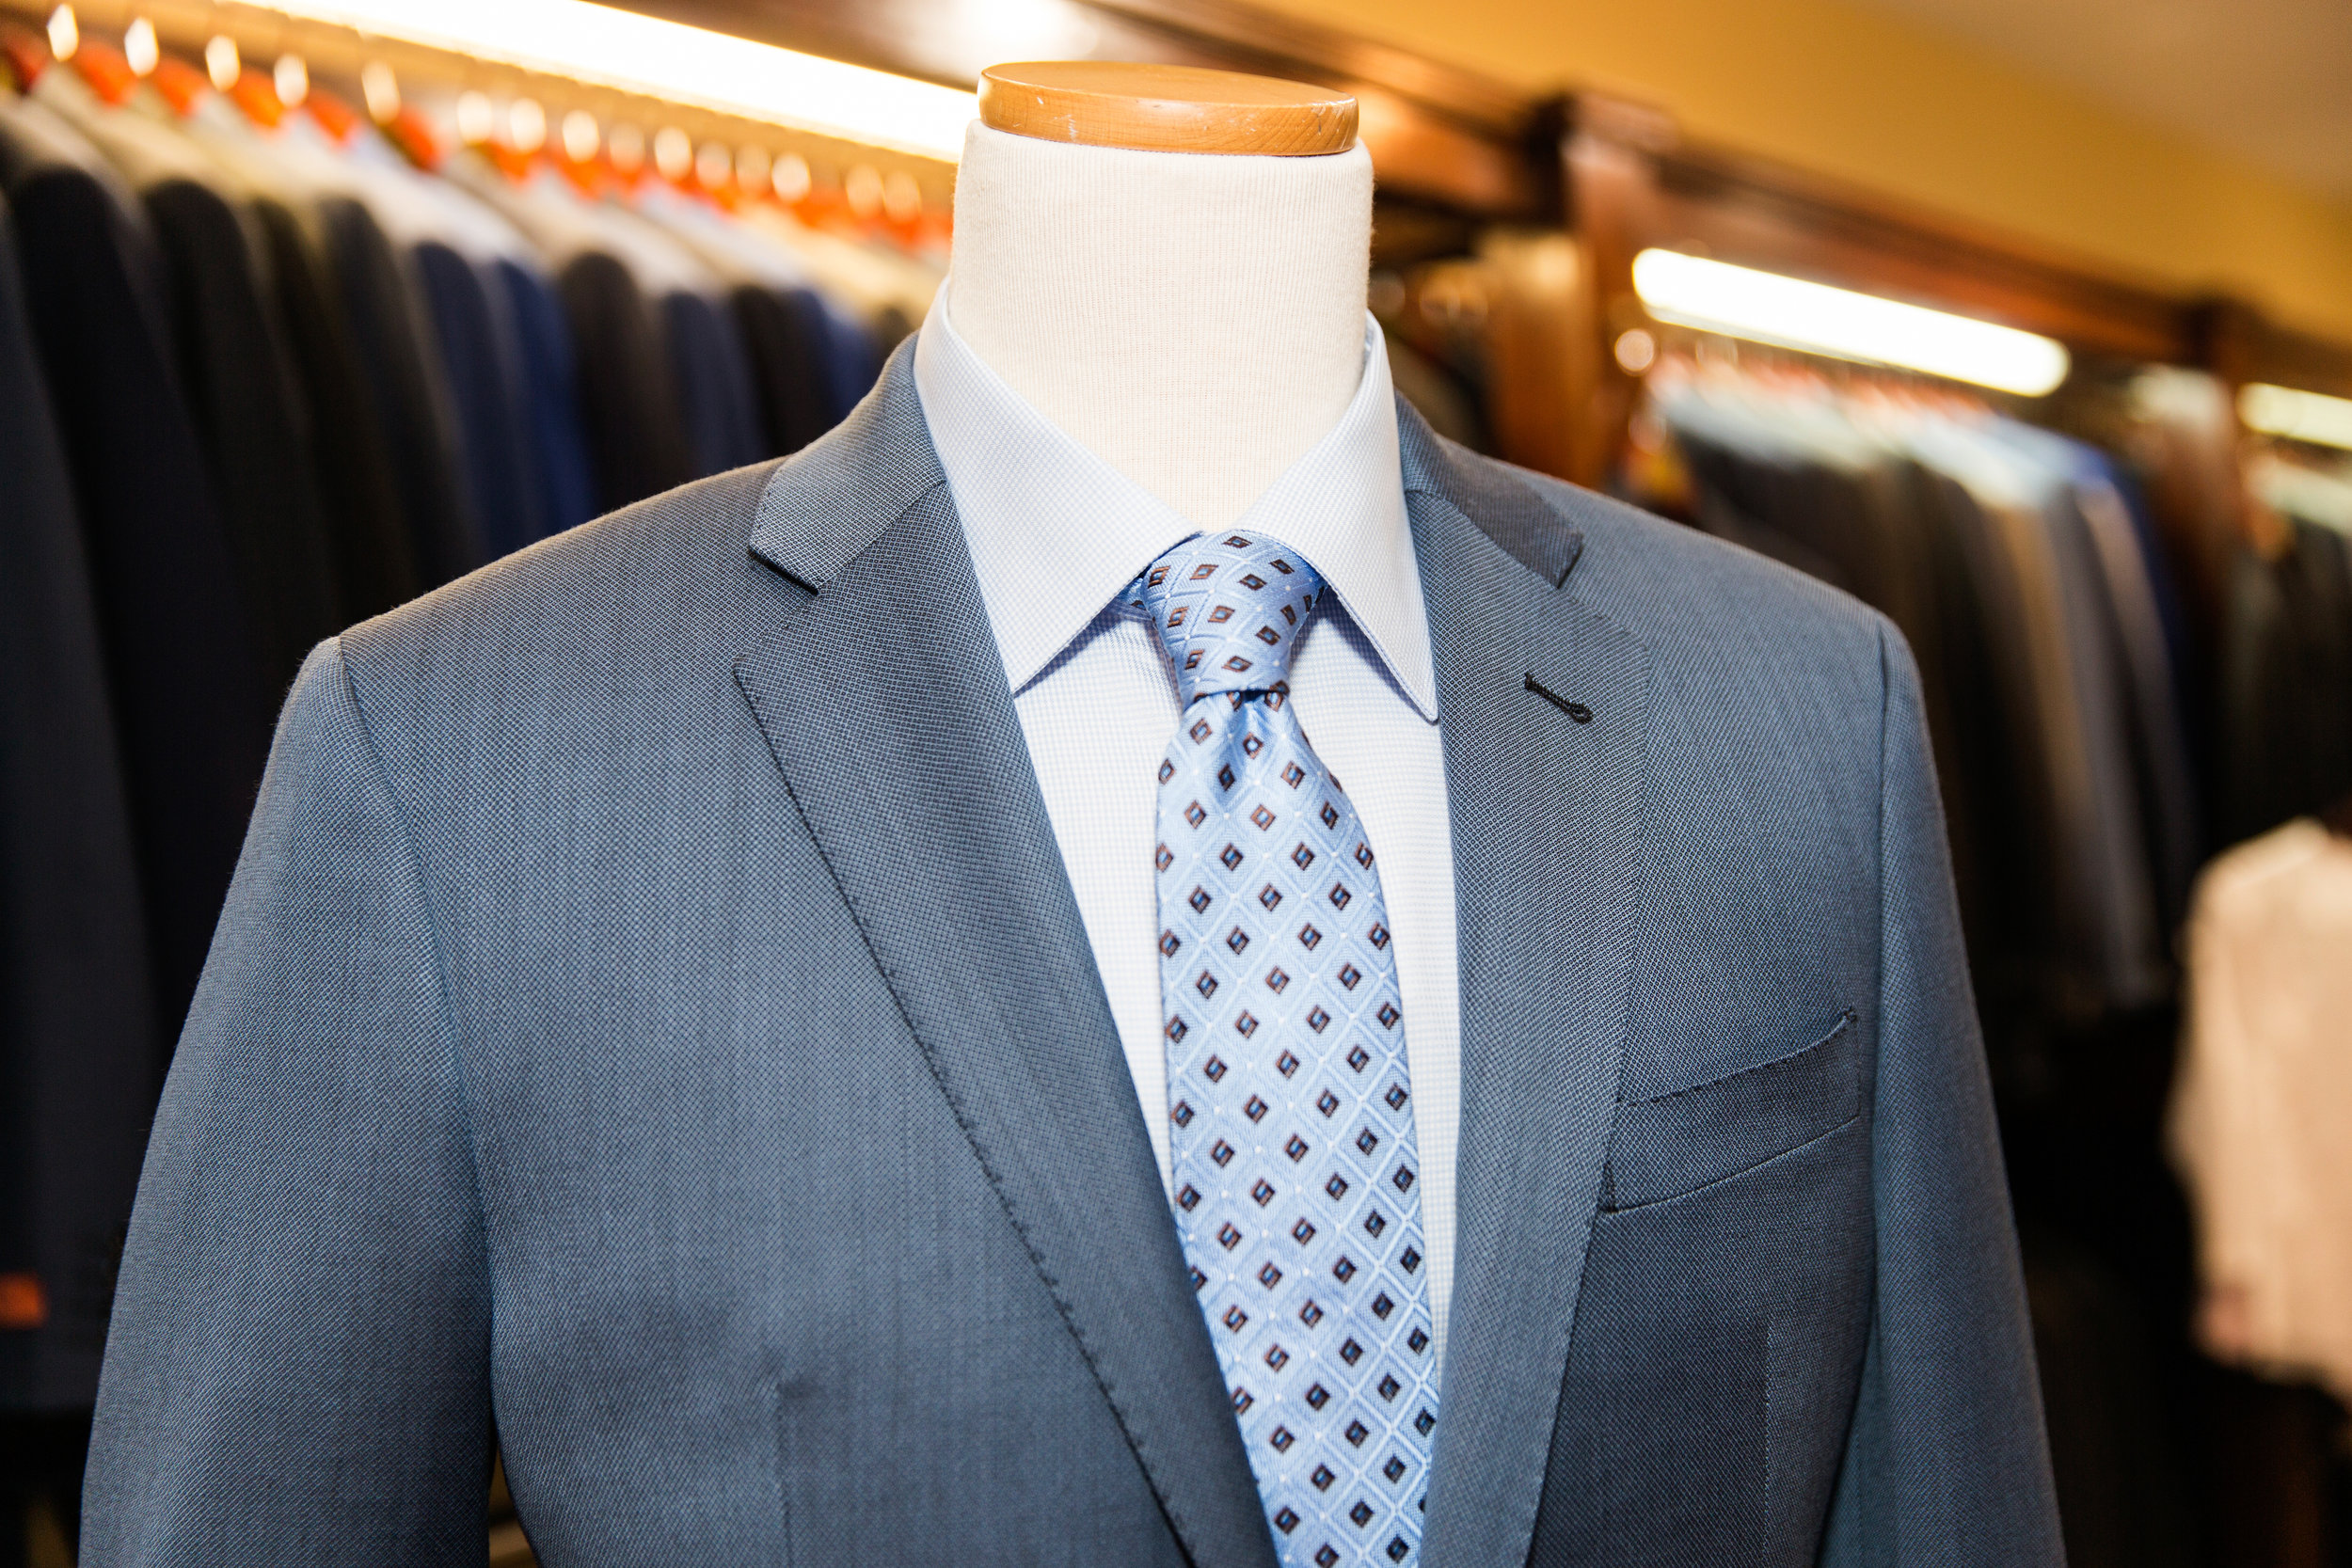 Suits-52.jpg